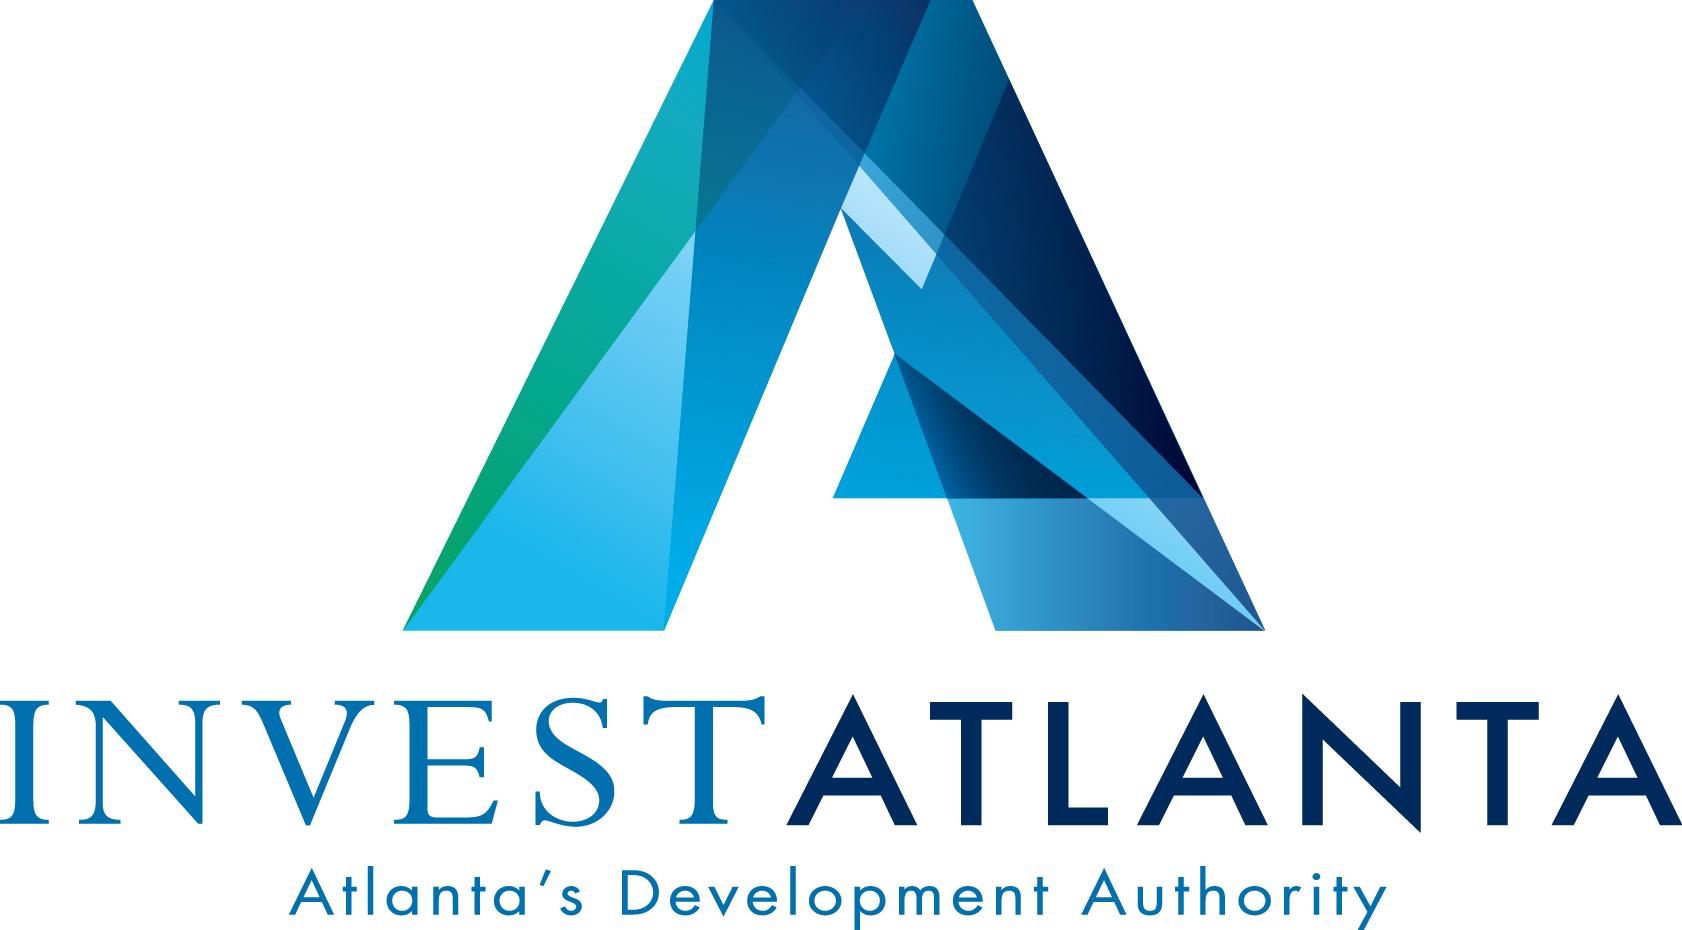 invest atlanta logo.jpg